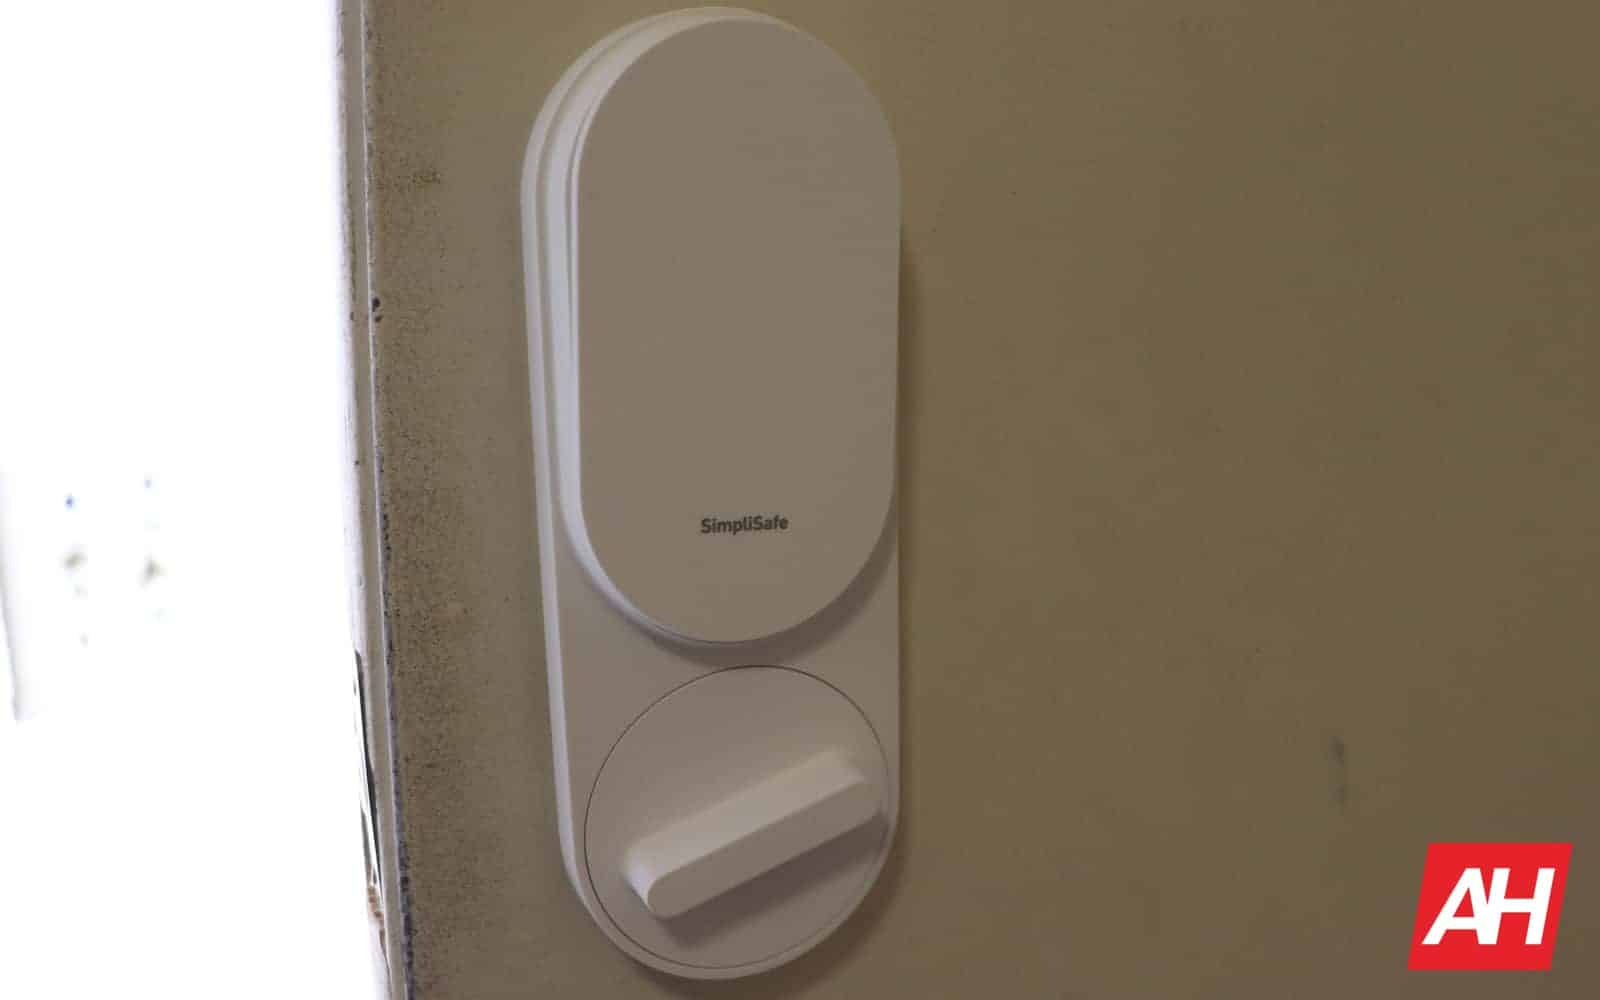 SimpliSafe Review 04 3 Installation AH 2019